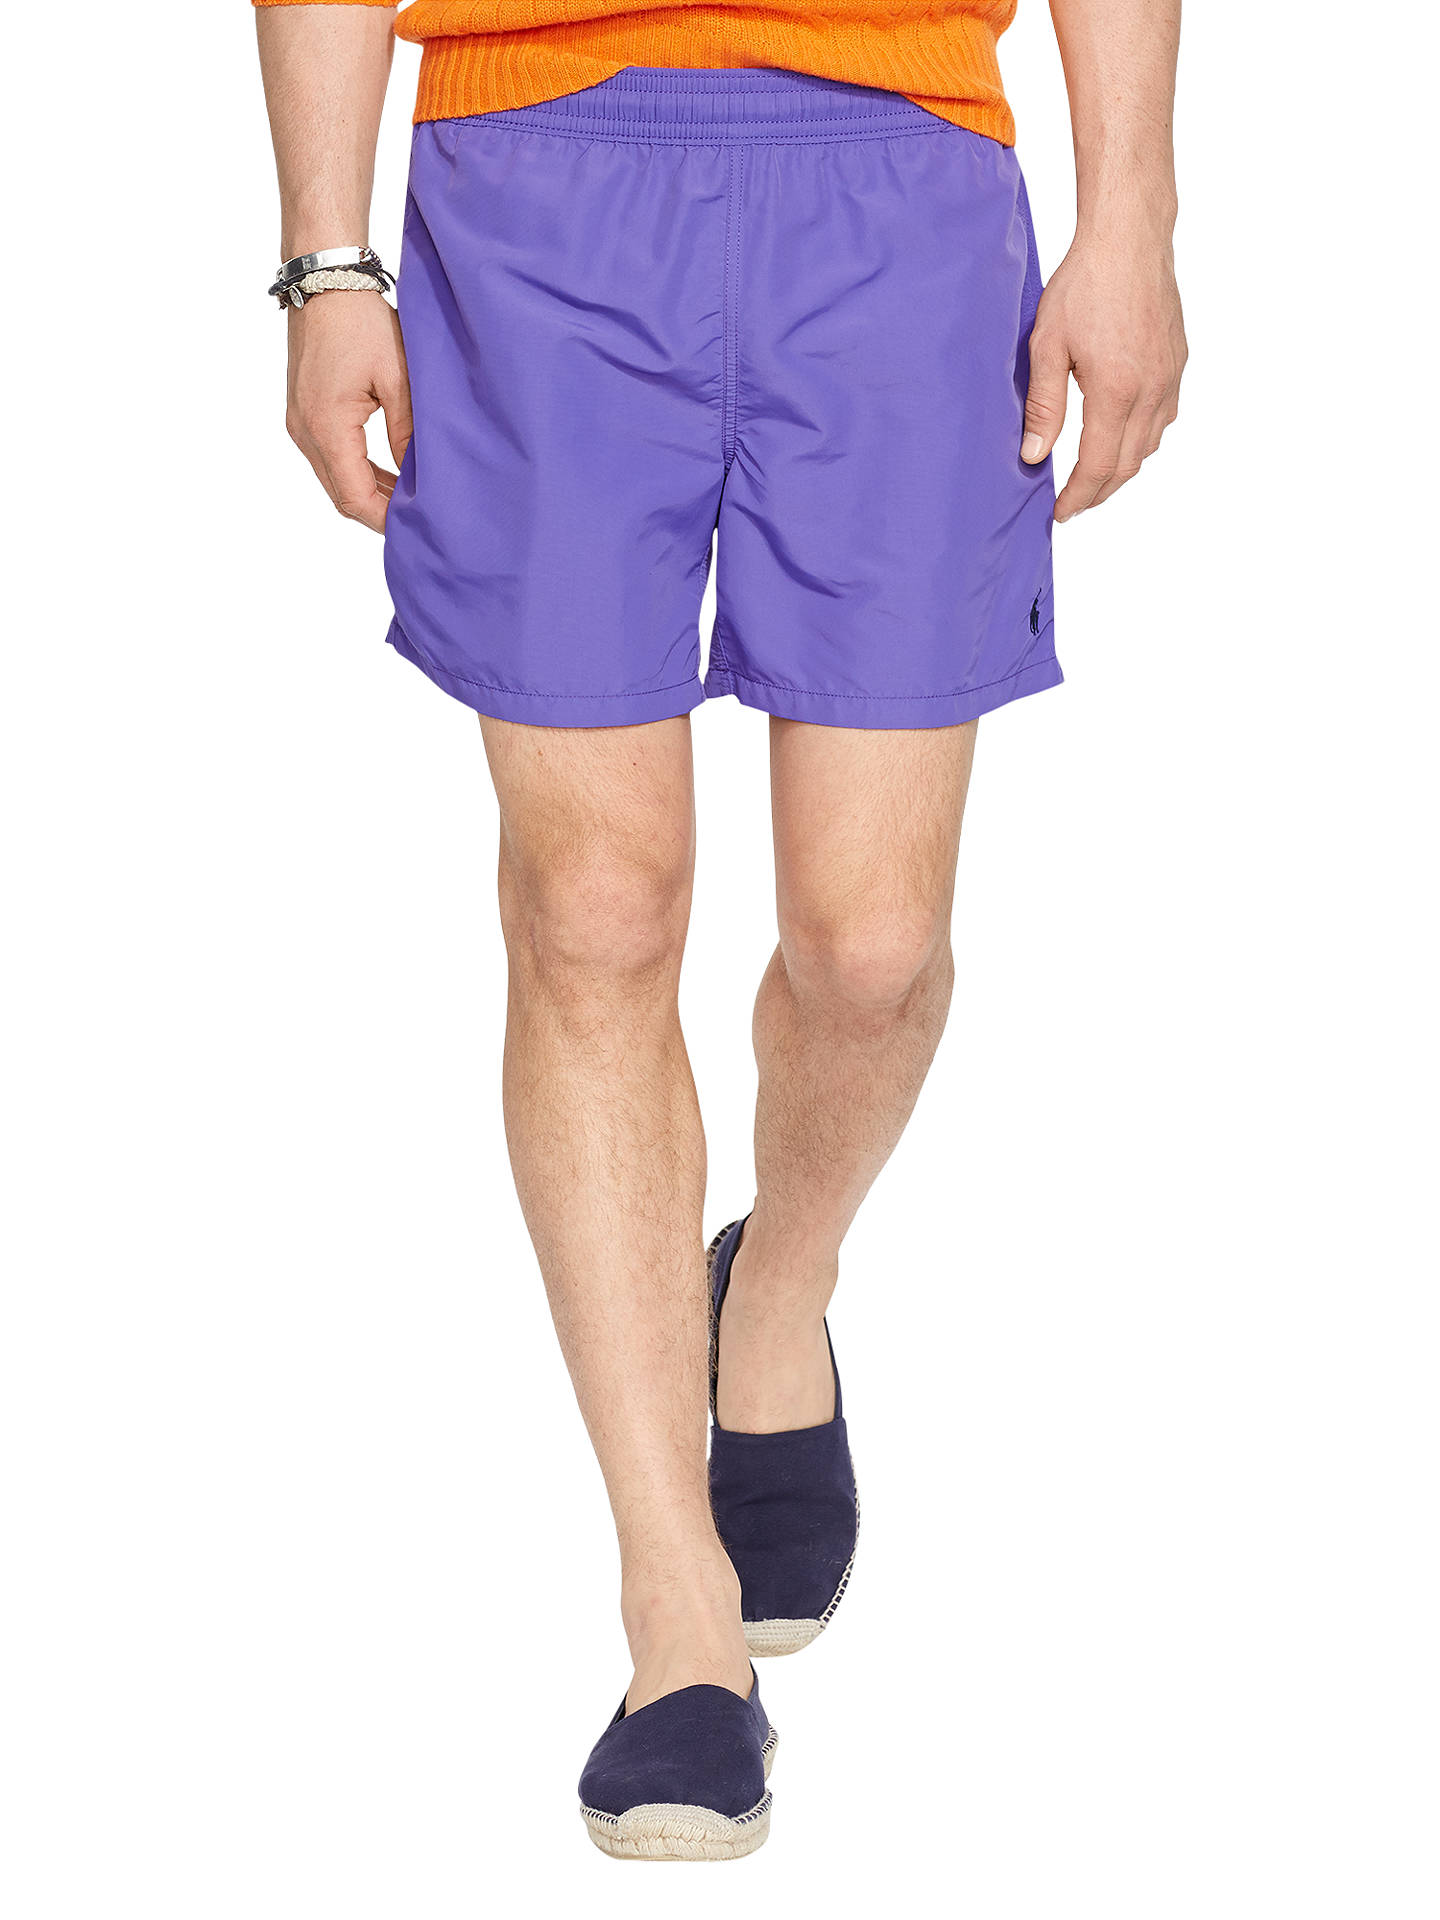 b1b40ebb Buy Polo Ralph Lauren Hawaiian Swim Shorts, Purple, S Online at  johnlewis.com ...